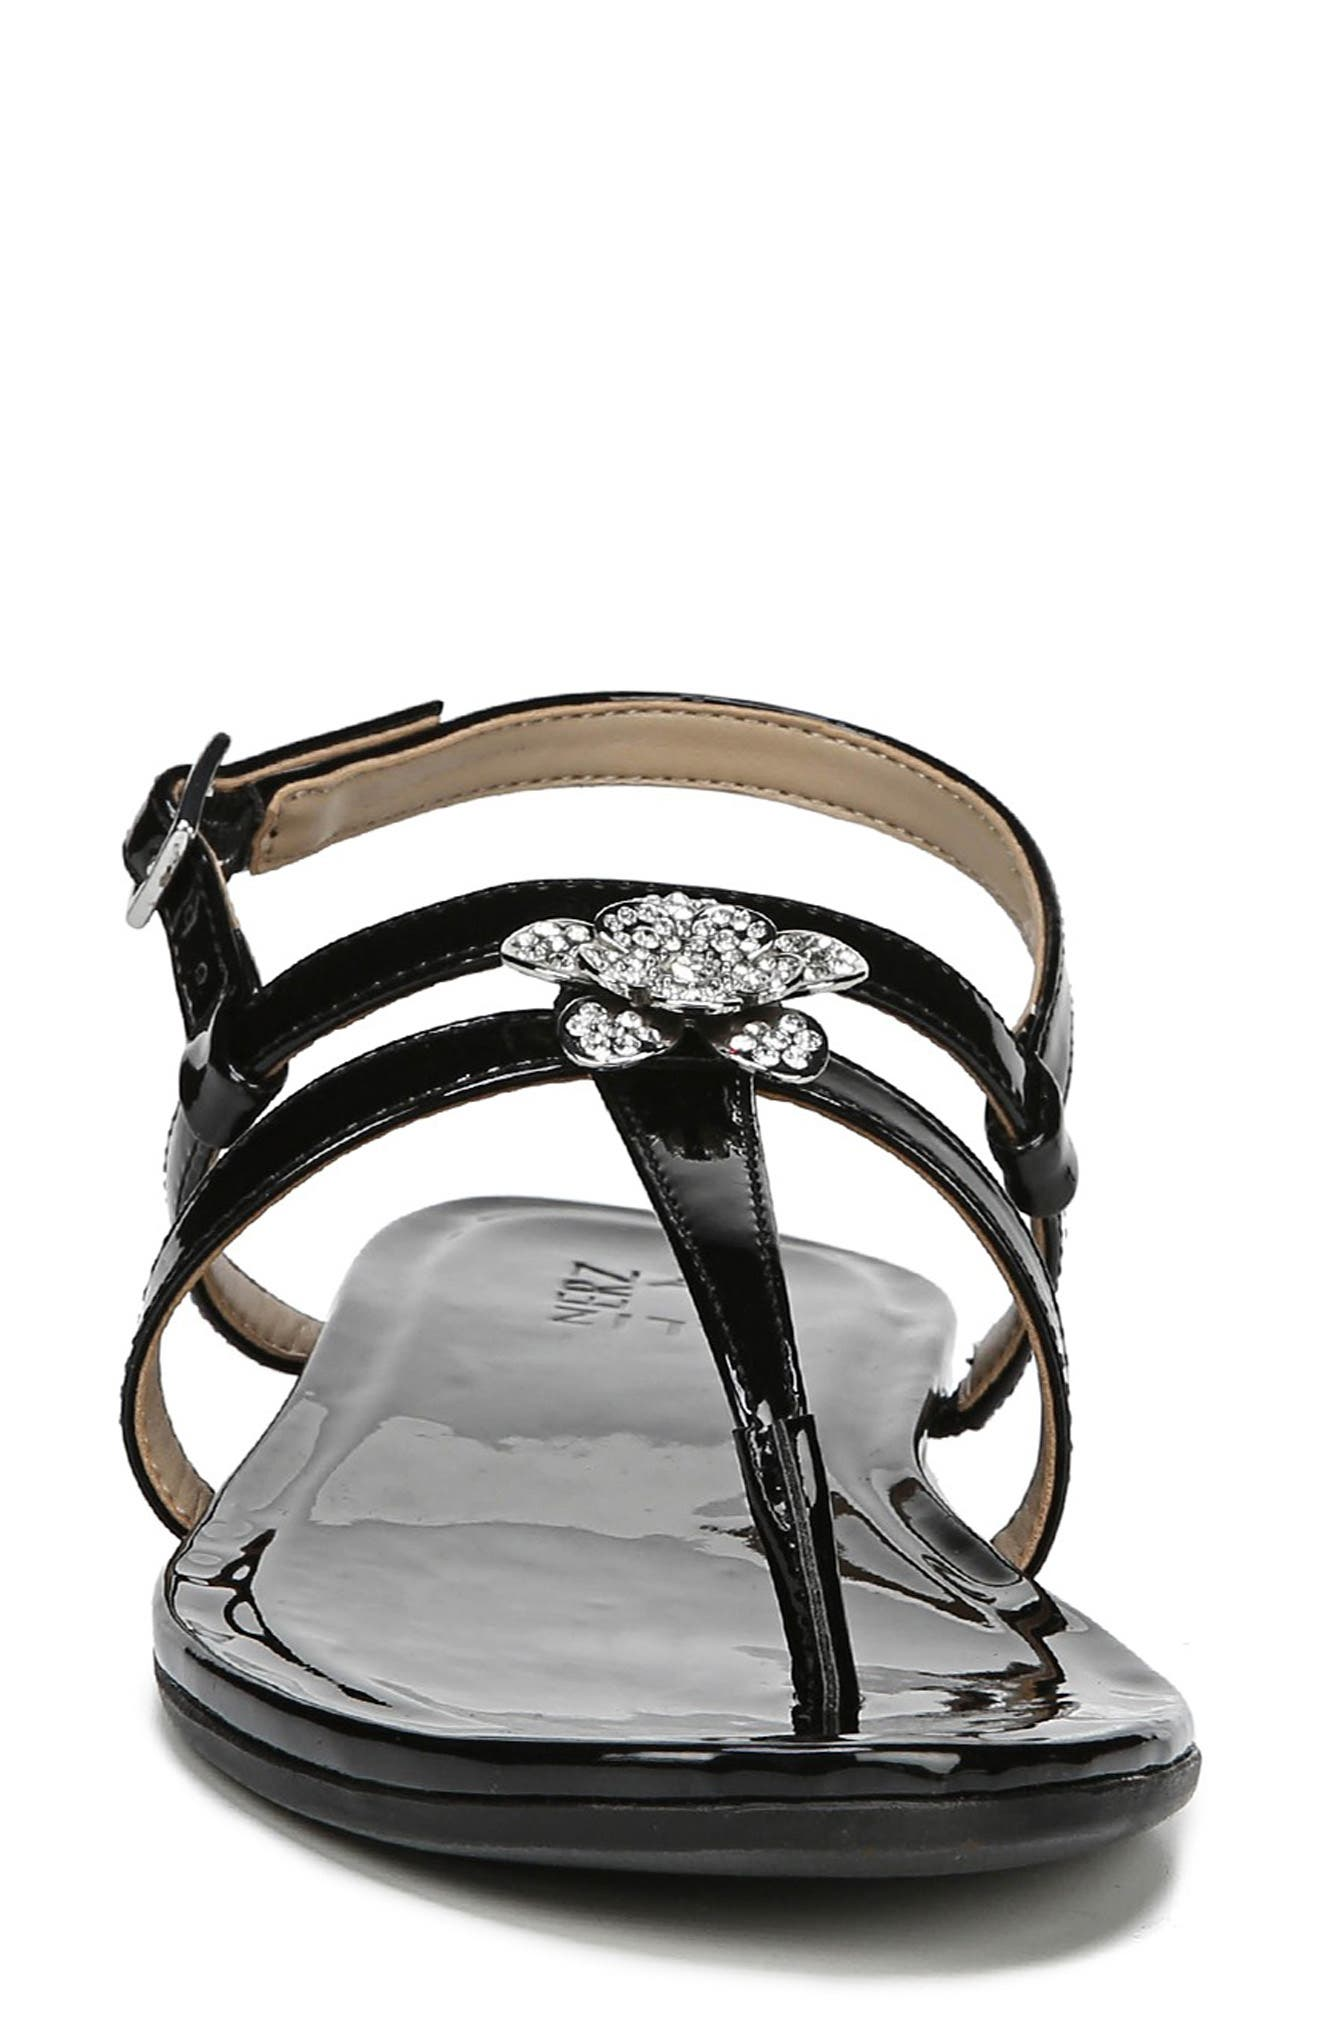 Tilly Embellished Sandal,                             Alternate thumbnail 4, color,                             BLACK PATENT FAUX LEATHER